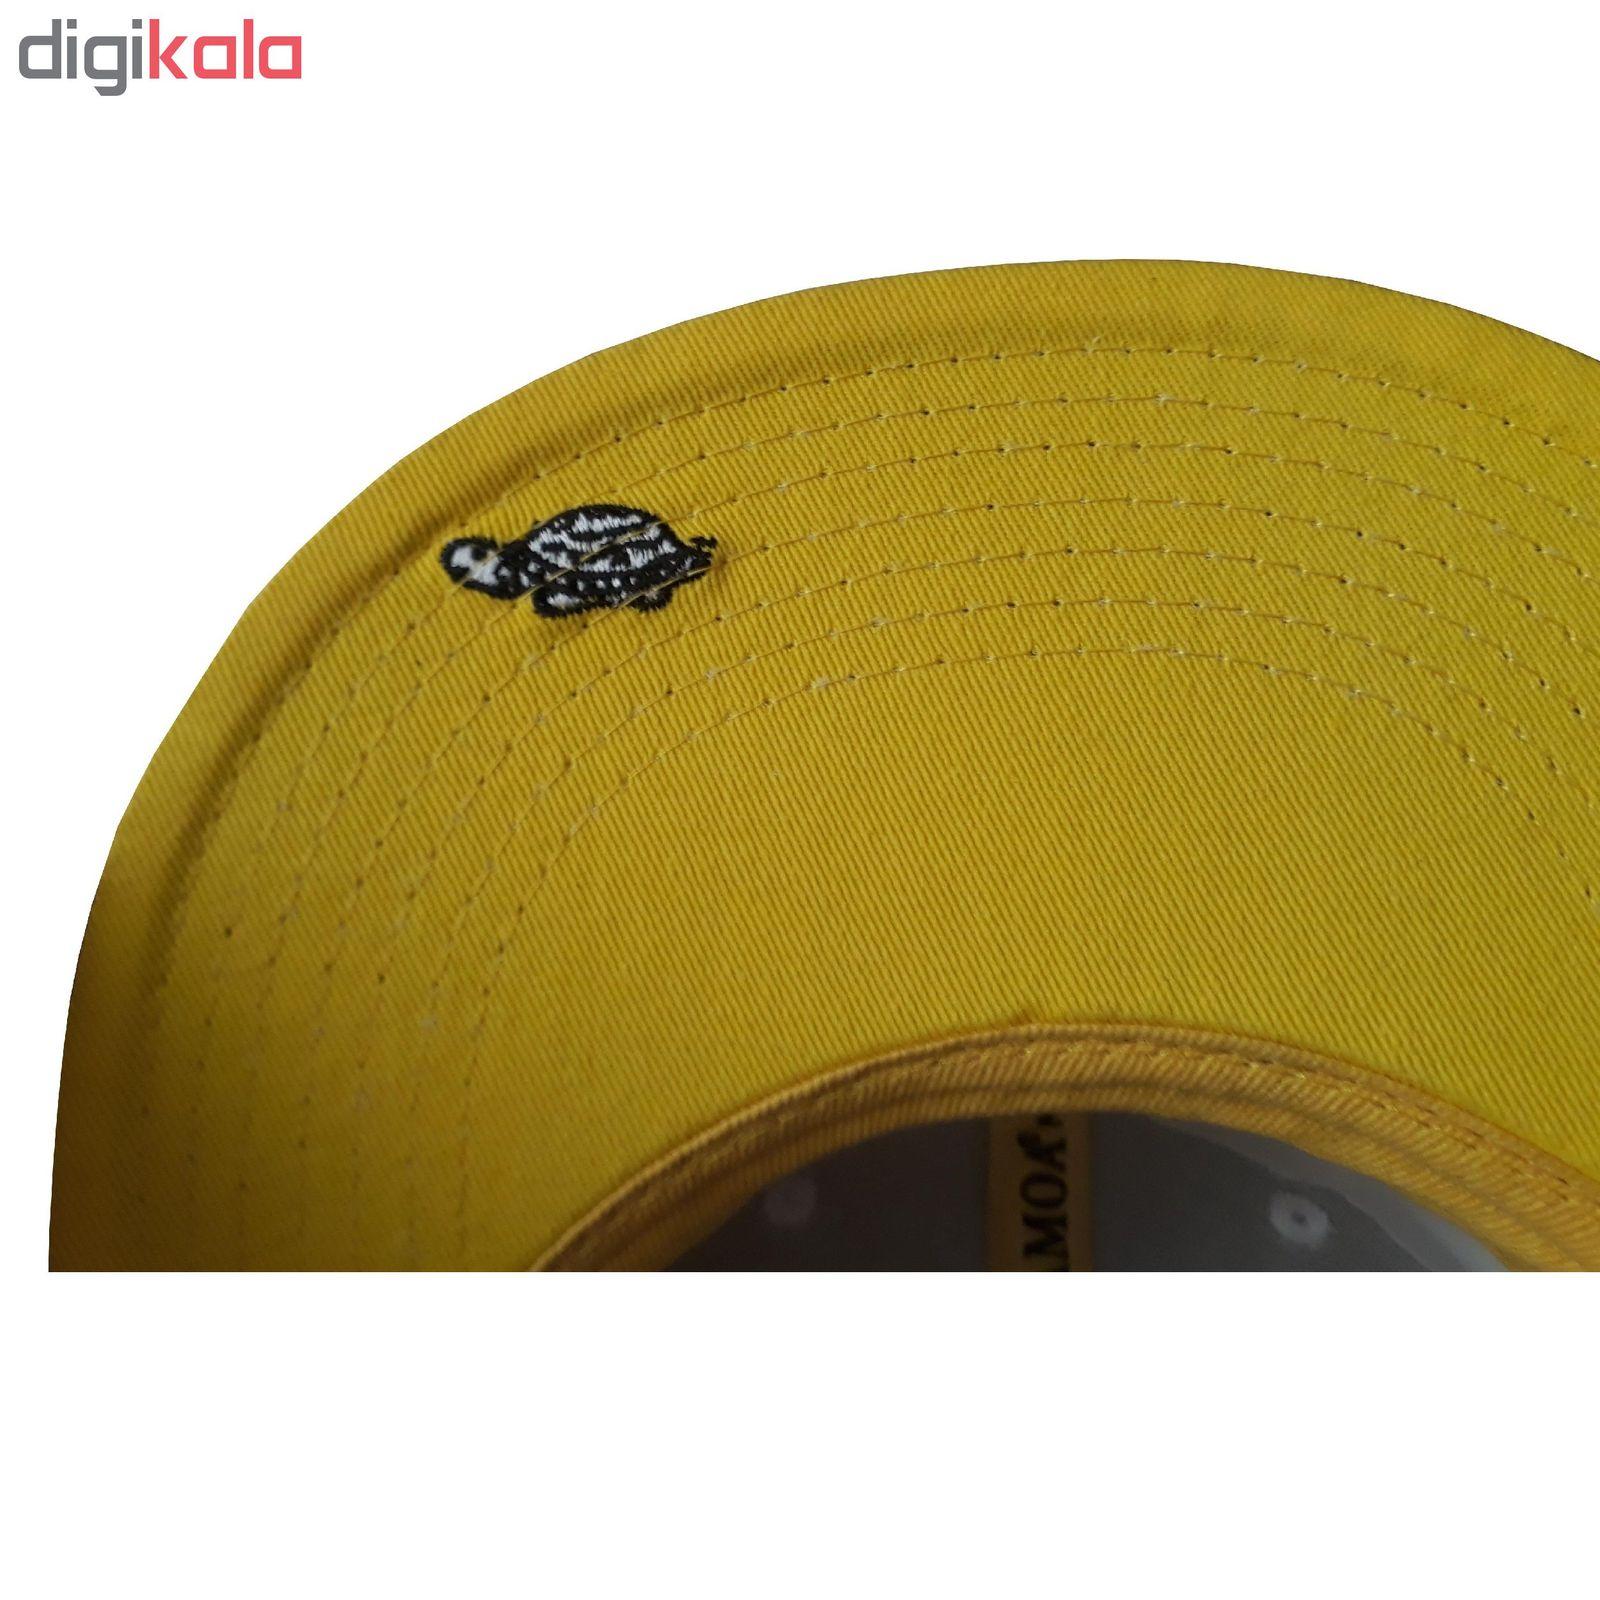 کلاه کپ مدل A254-01 main 1 5